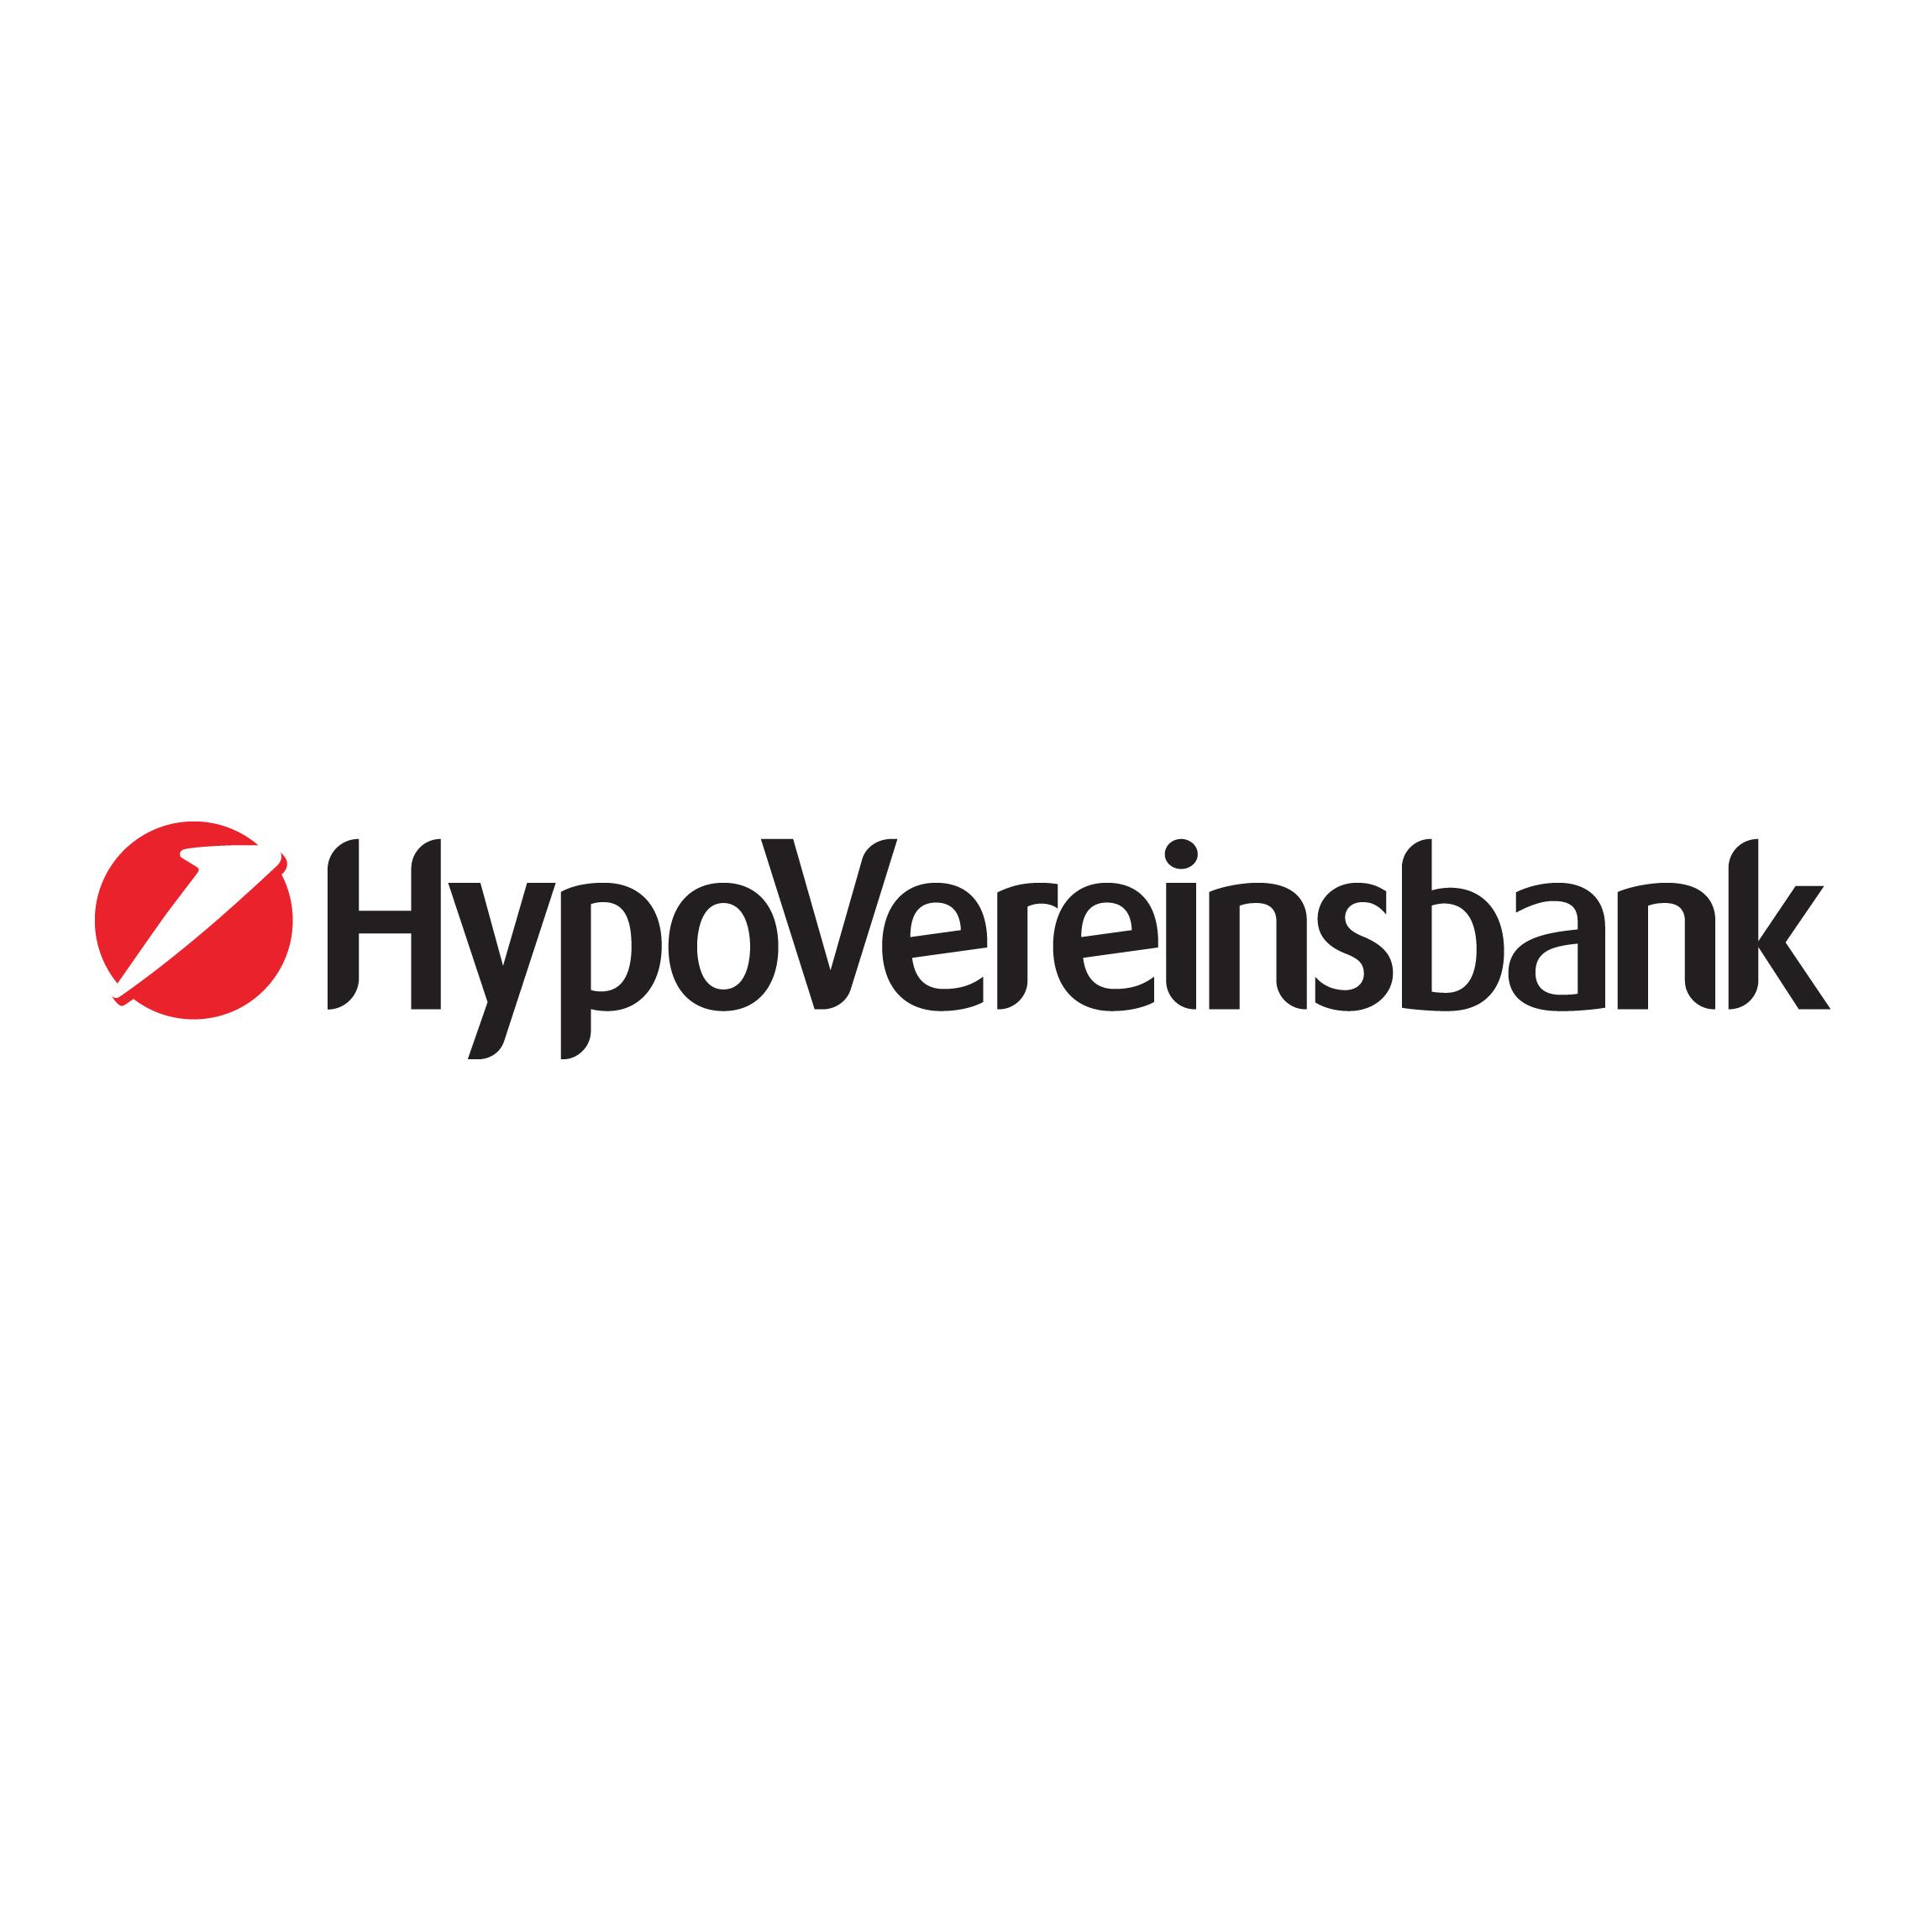 HypoVereinsbank Private Banking Nürnberg